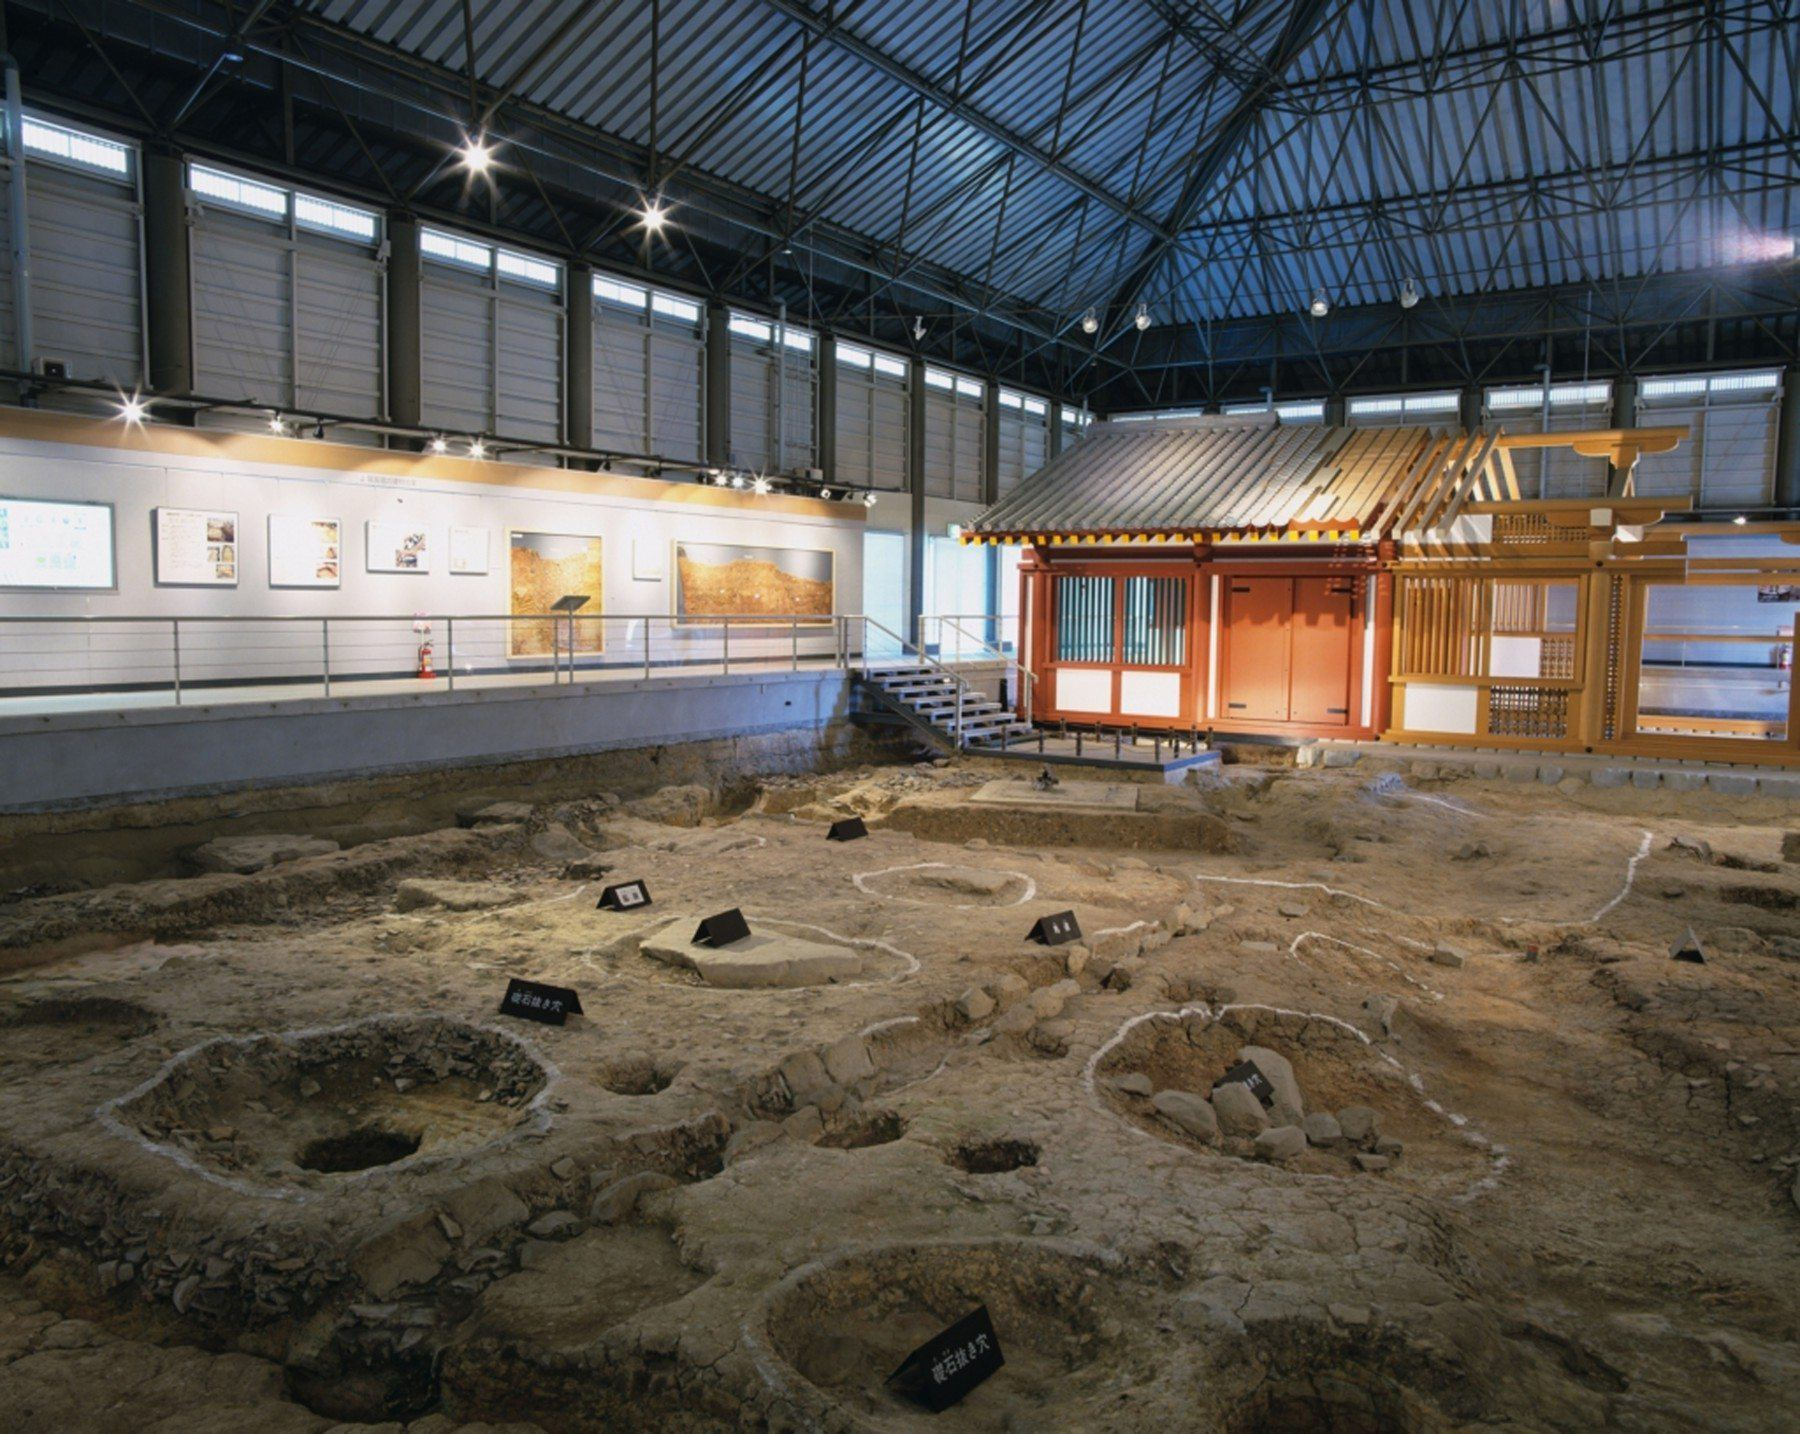 鴻臚館跡展示館の内部(撮影年不明)の画像